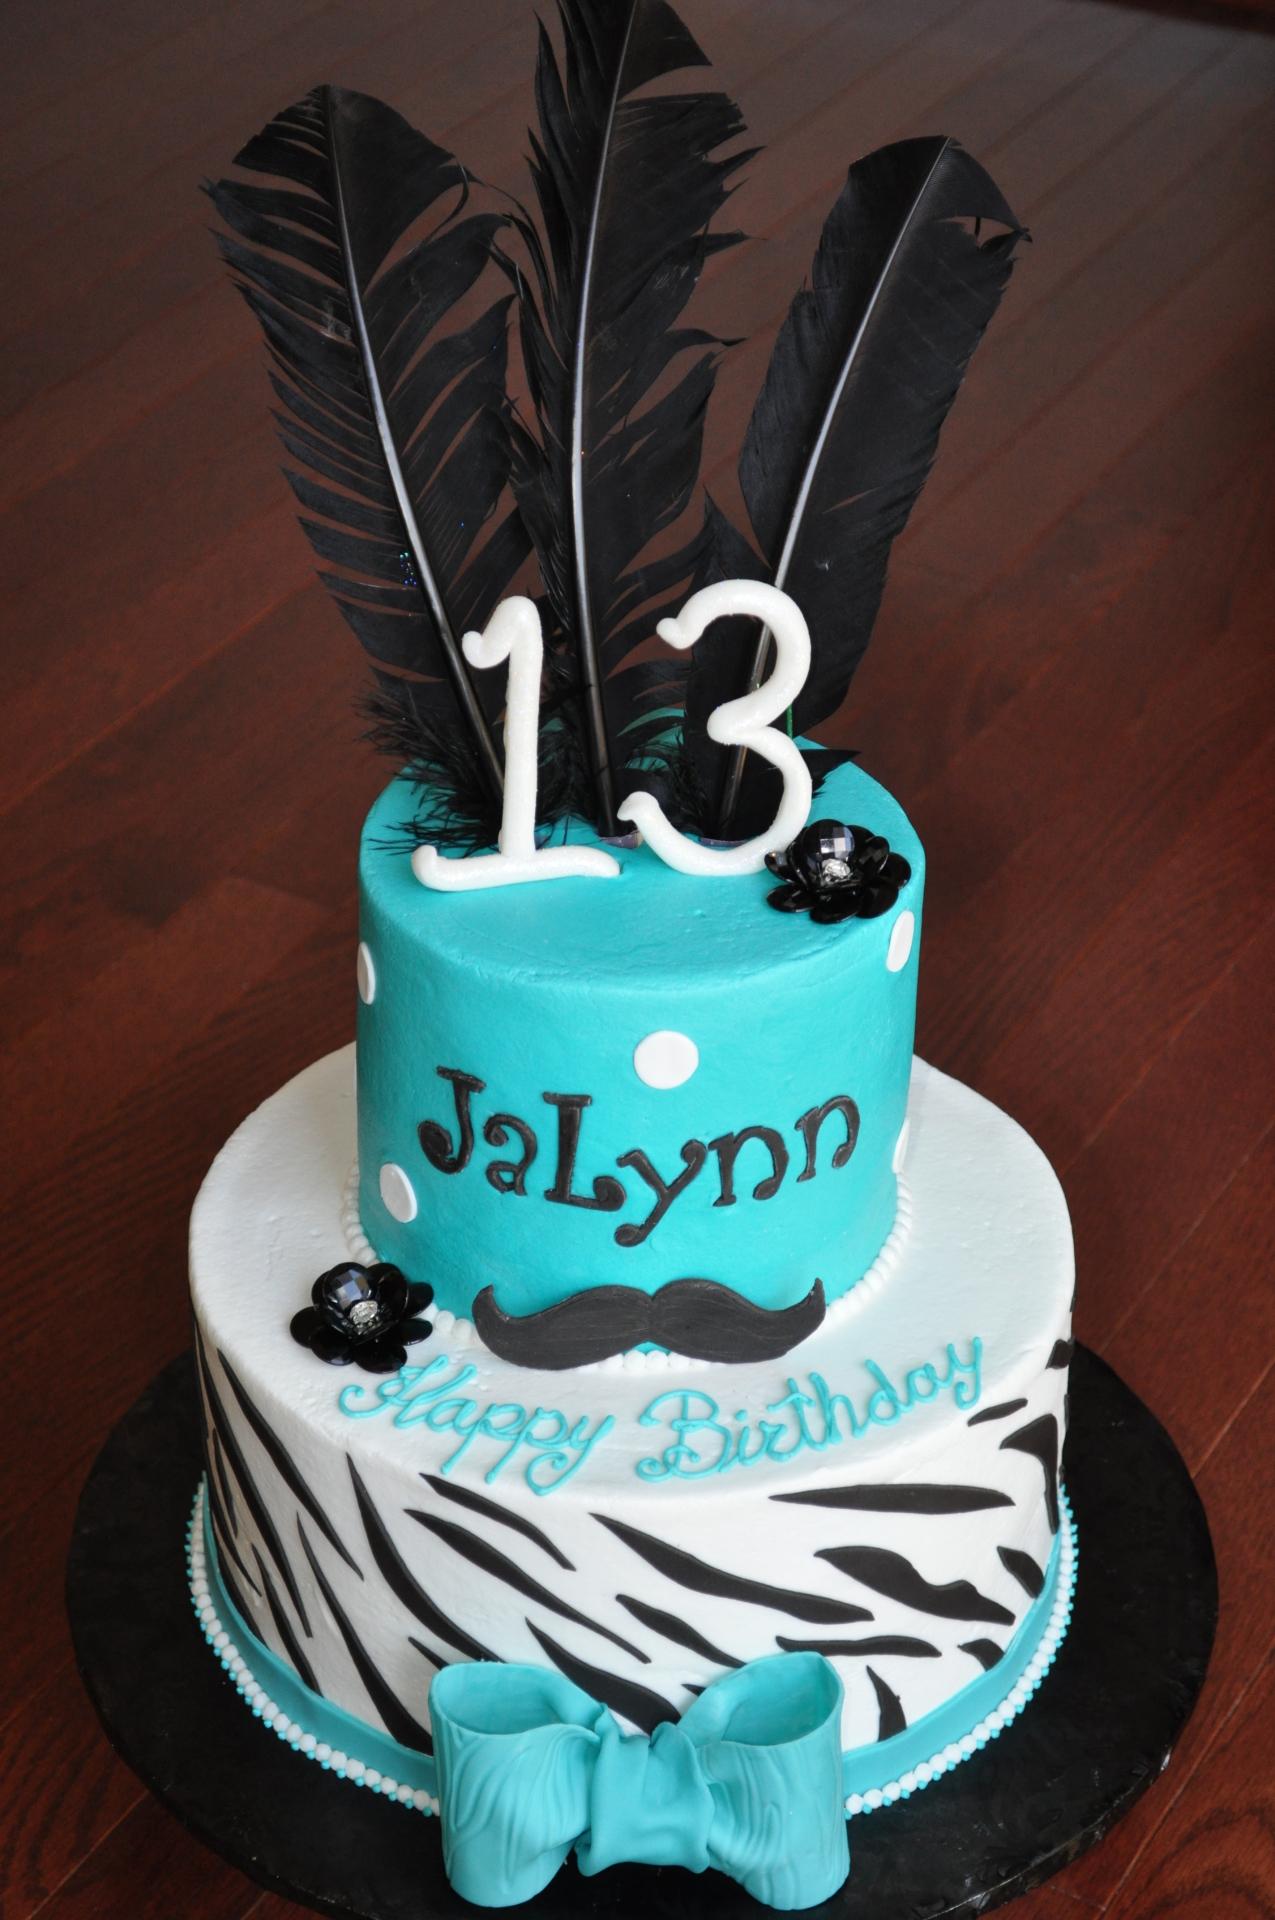 Zebra stripes 13th birthday cake, mustache theme cake